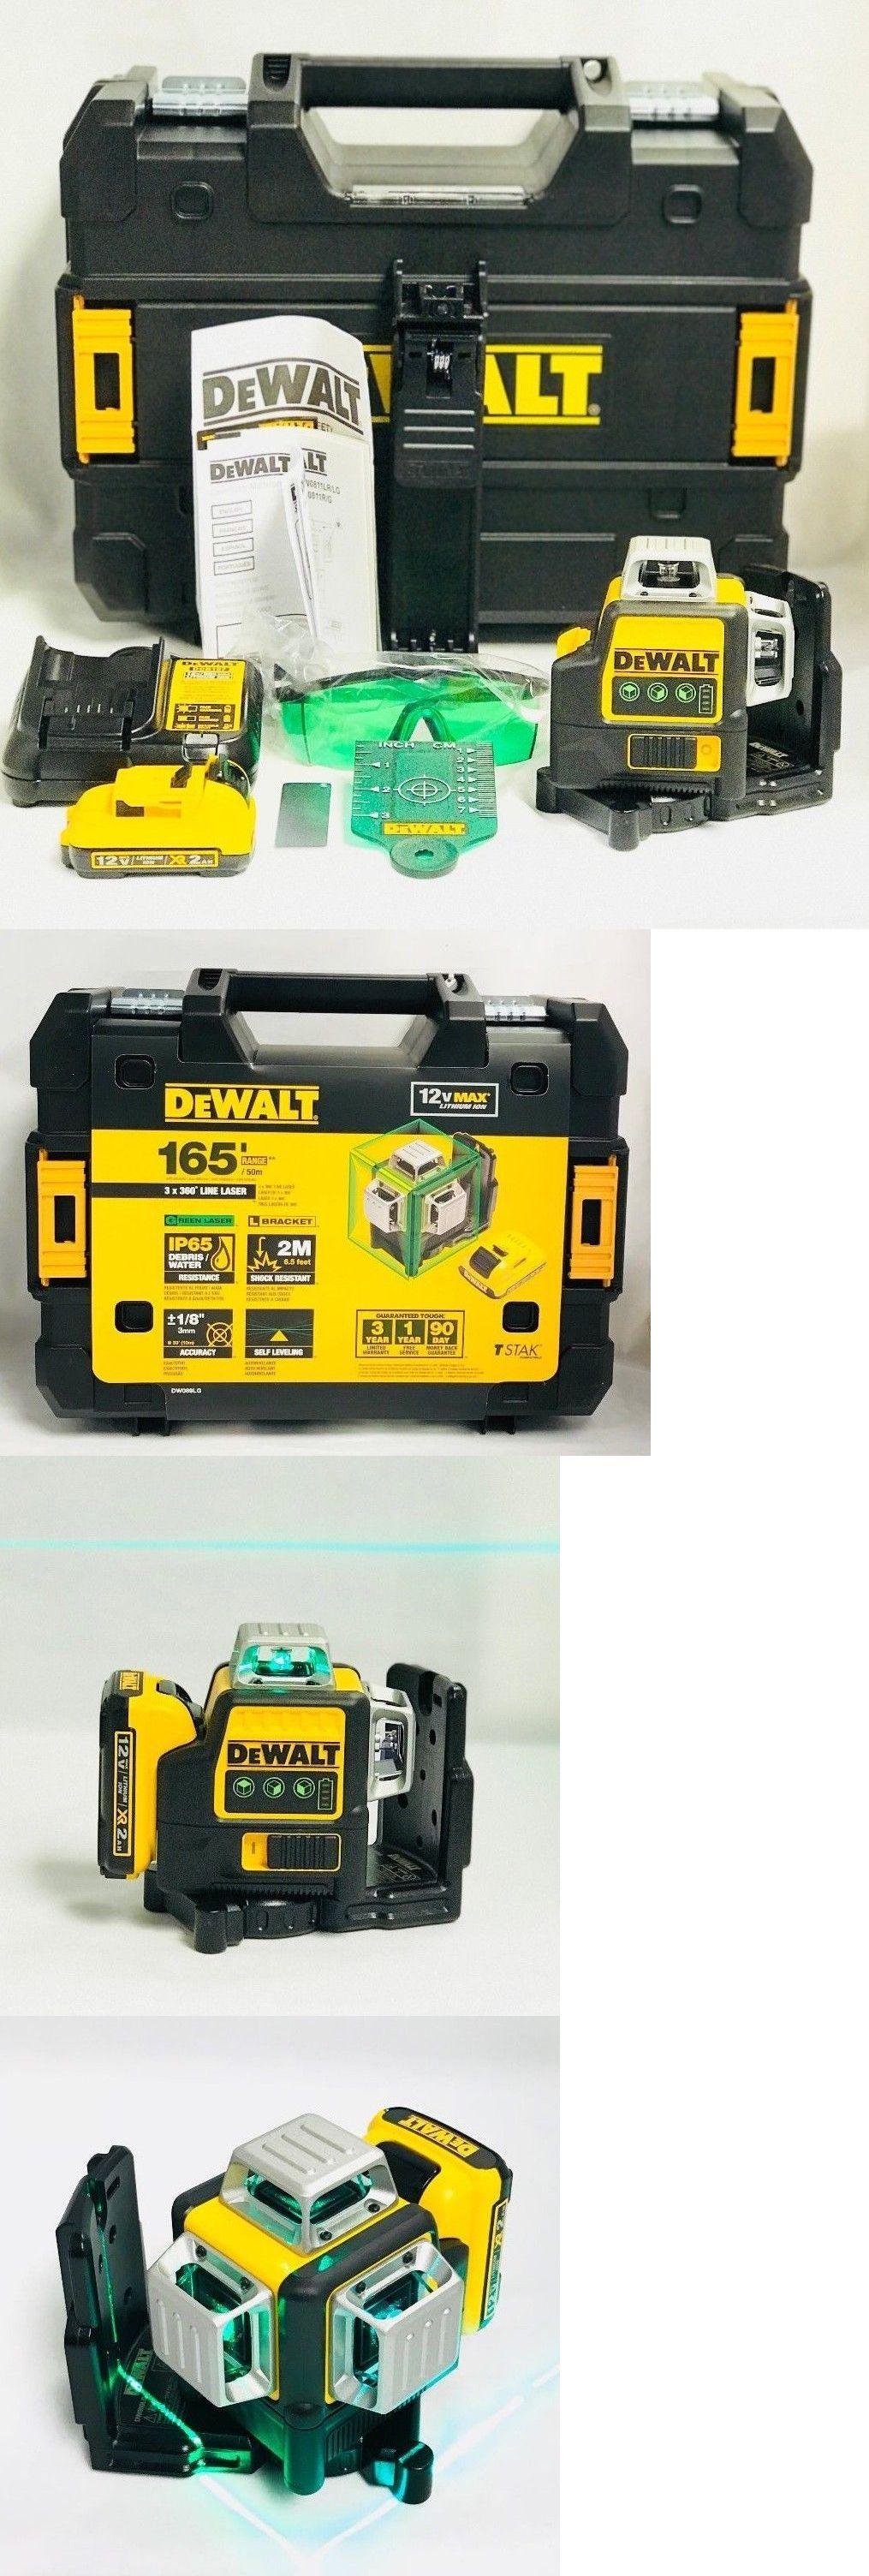 Dewalt Dw089lg 12 Volt 3 X 360 Degree Lit Ion Green Beam Line Laser New No Tax Dewalt Measuring Tools Beams